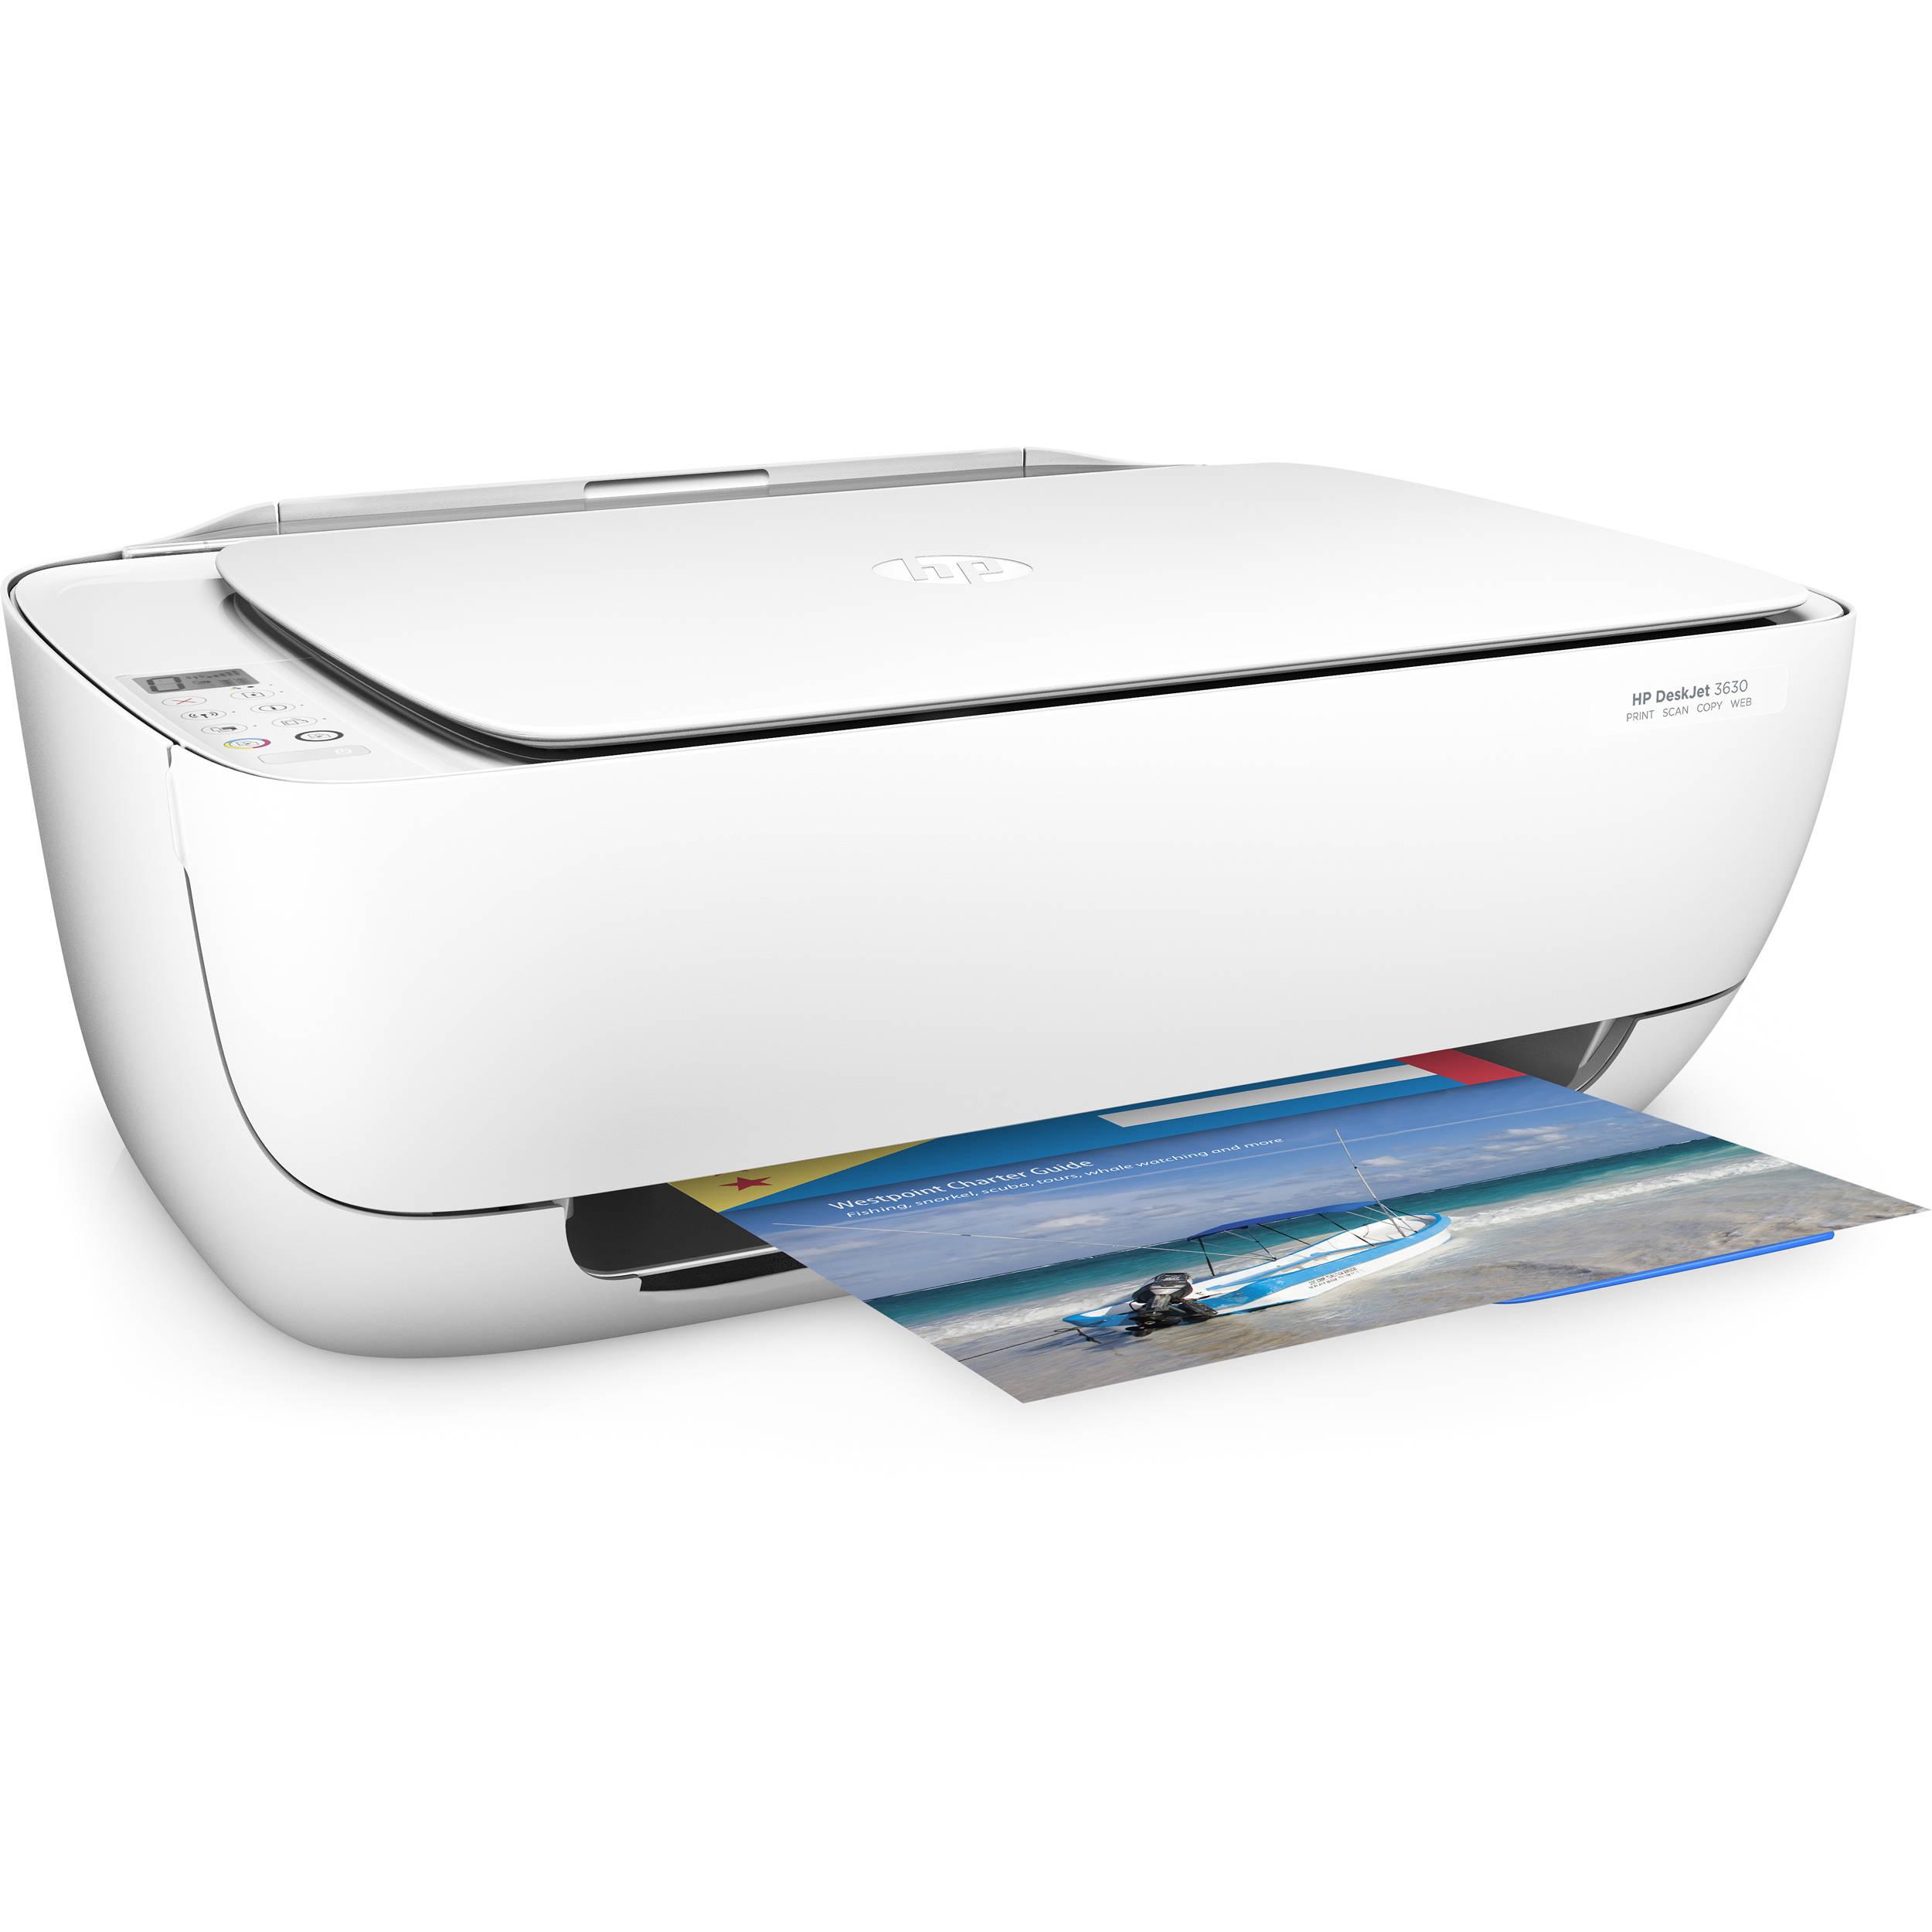 HP DeskJet 3630 All-in-One Inkjet Printer F5S57A#B1H B&H Photo